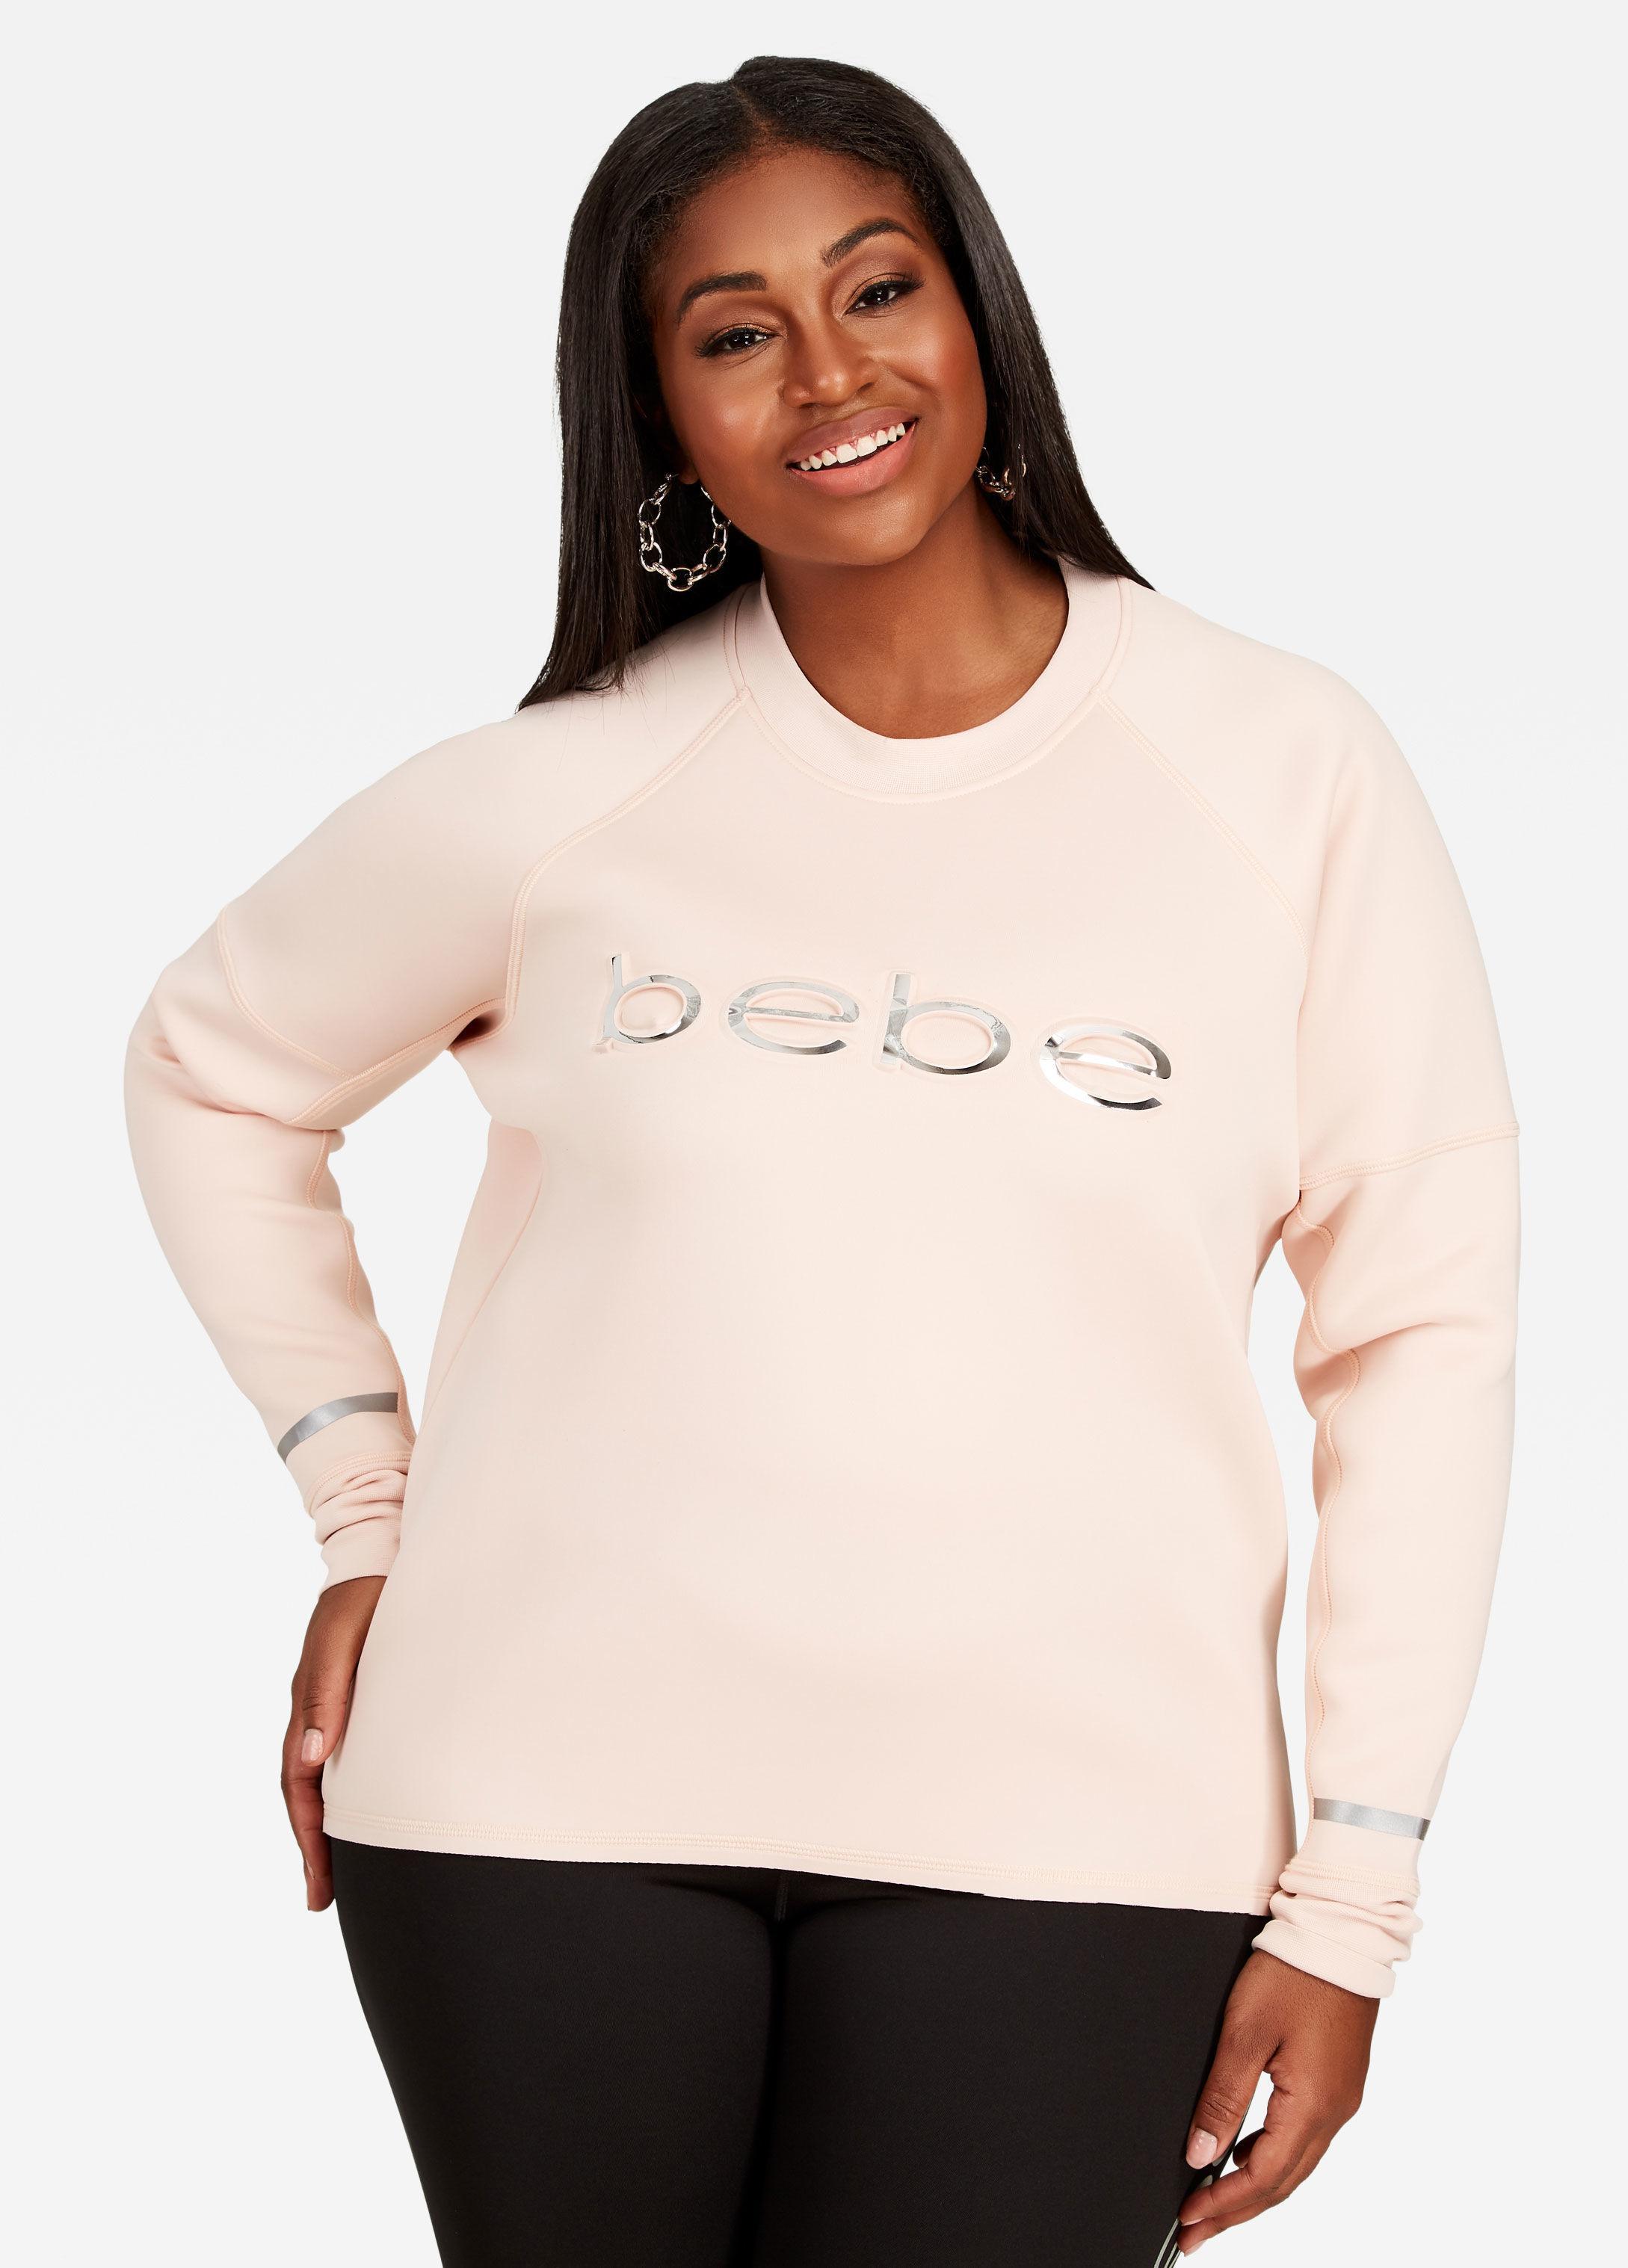 7c3eda93a85 Lyst - Ashley Stewart Plus Size Bebe Long Sleeve Scuba Top in Pink